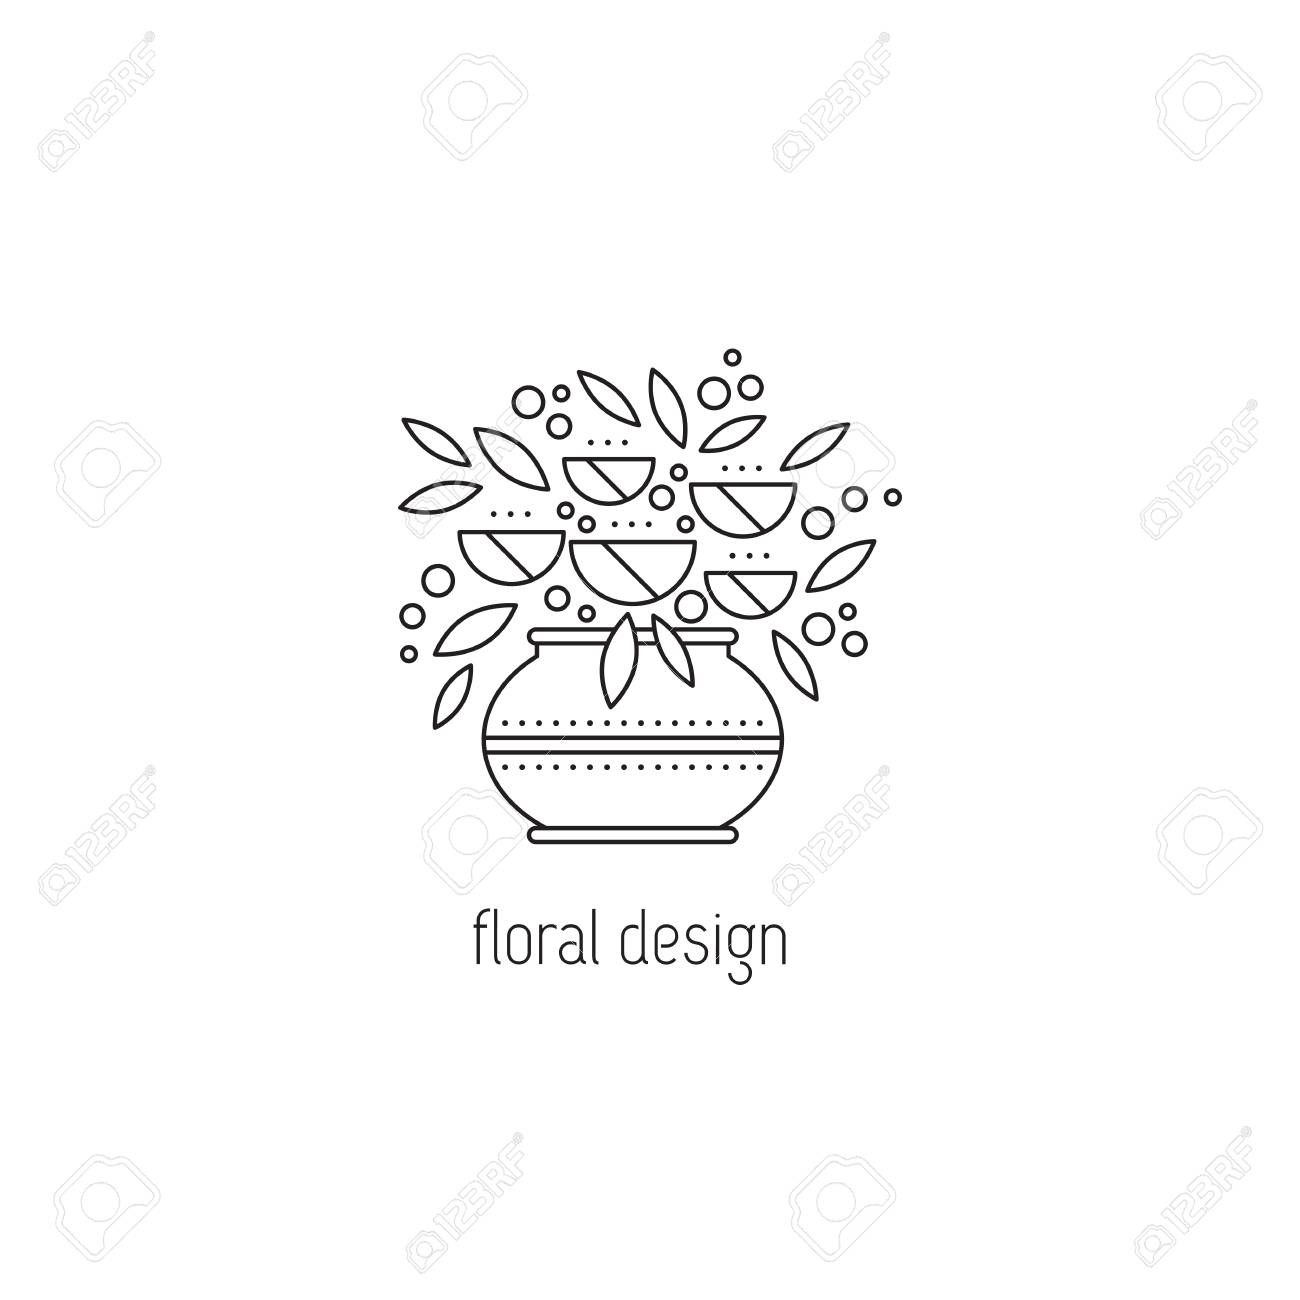 Floral Design Vector Thin Line Icon Vase With Flower Arrangement